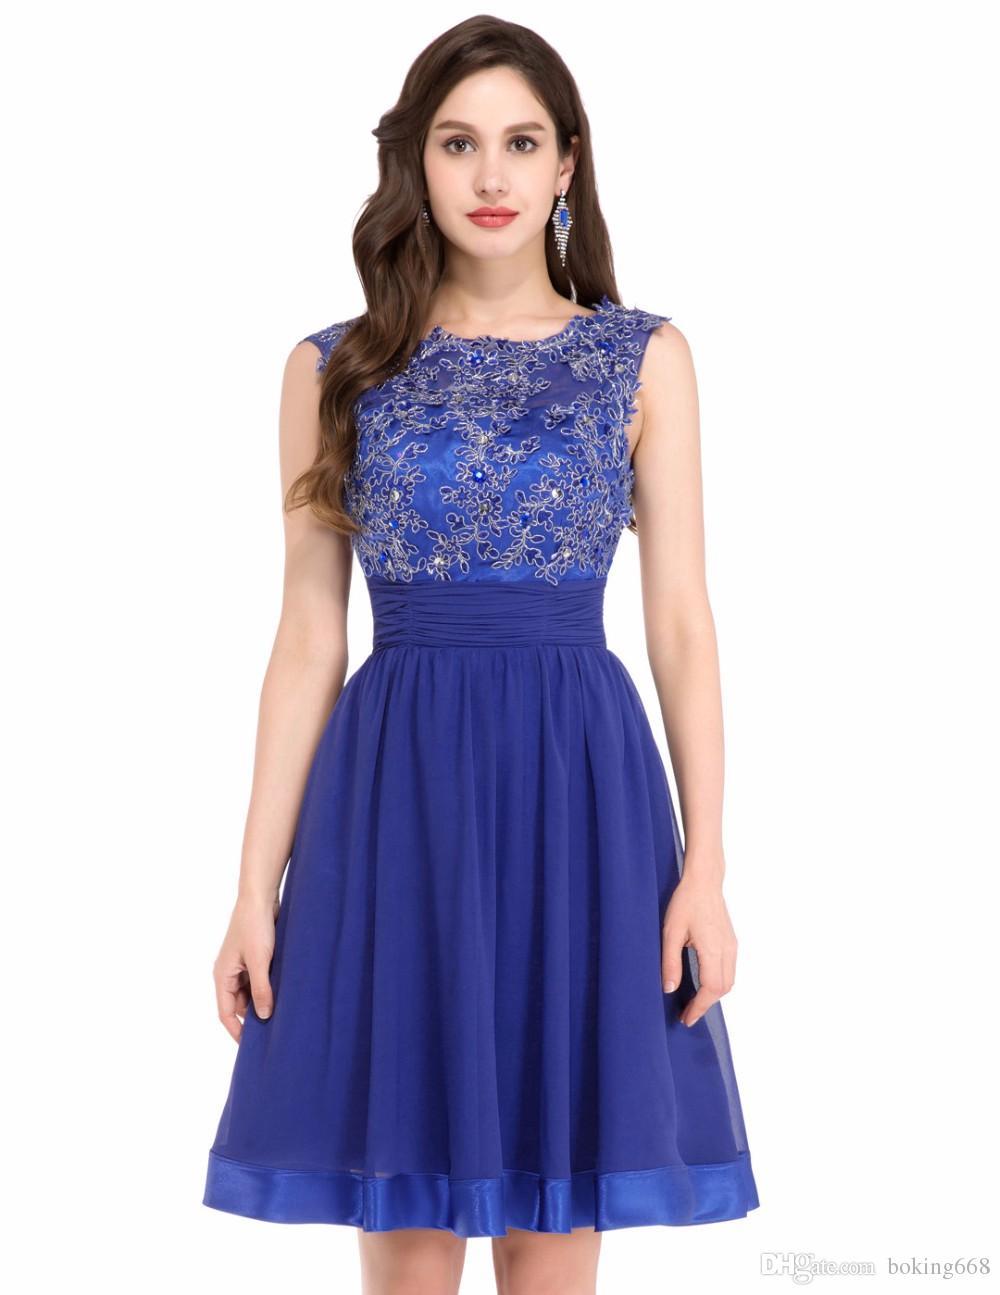 Sleeveless Navy Blue Prom Dresses Short Gowns 2018 Hollowed Back ...